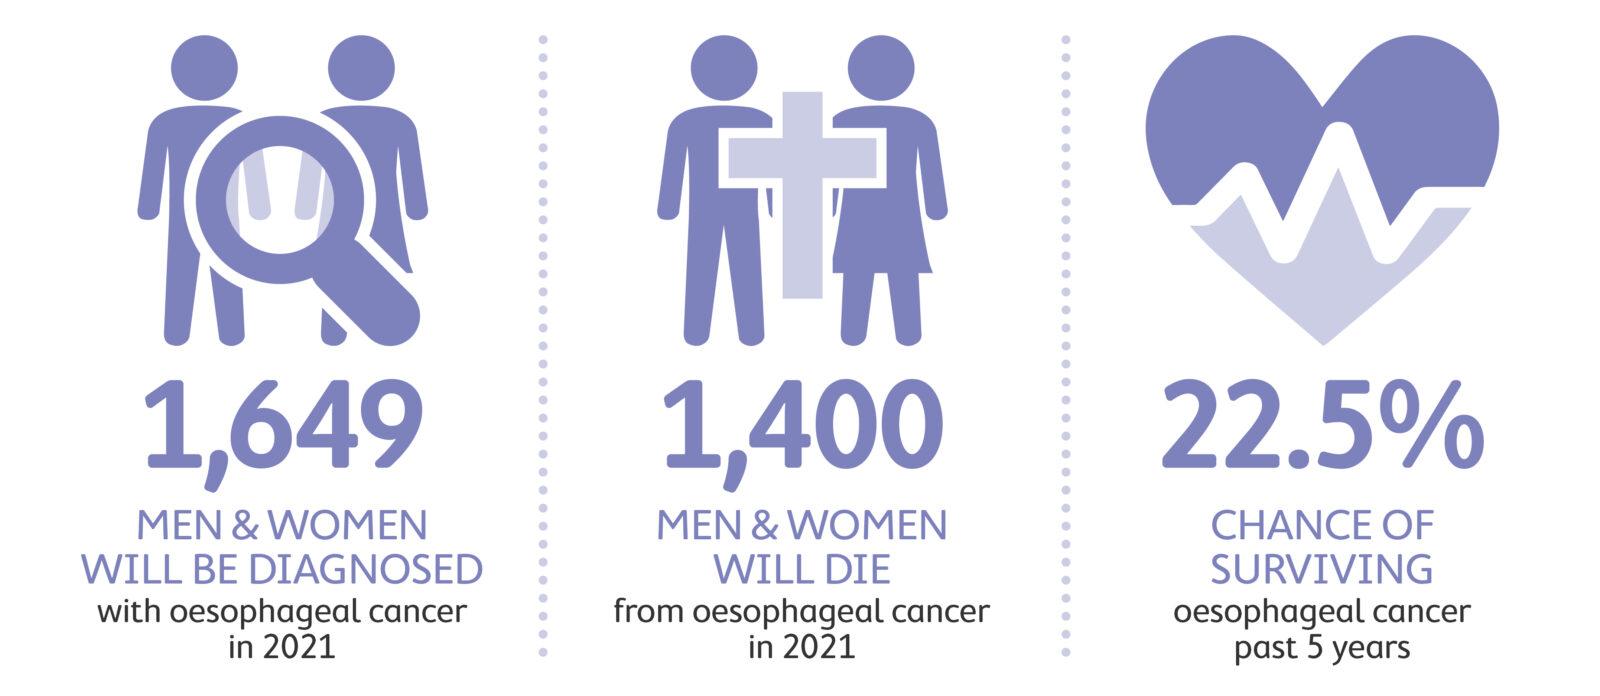 Oesophageal cancer statistics 2021